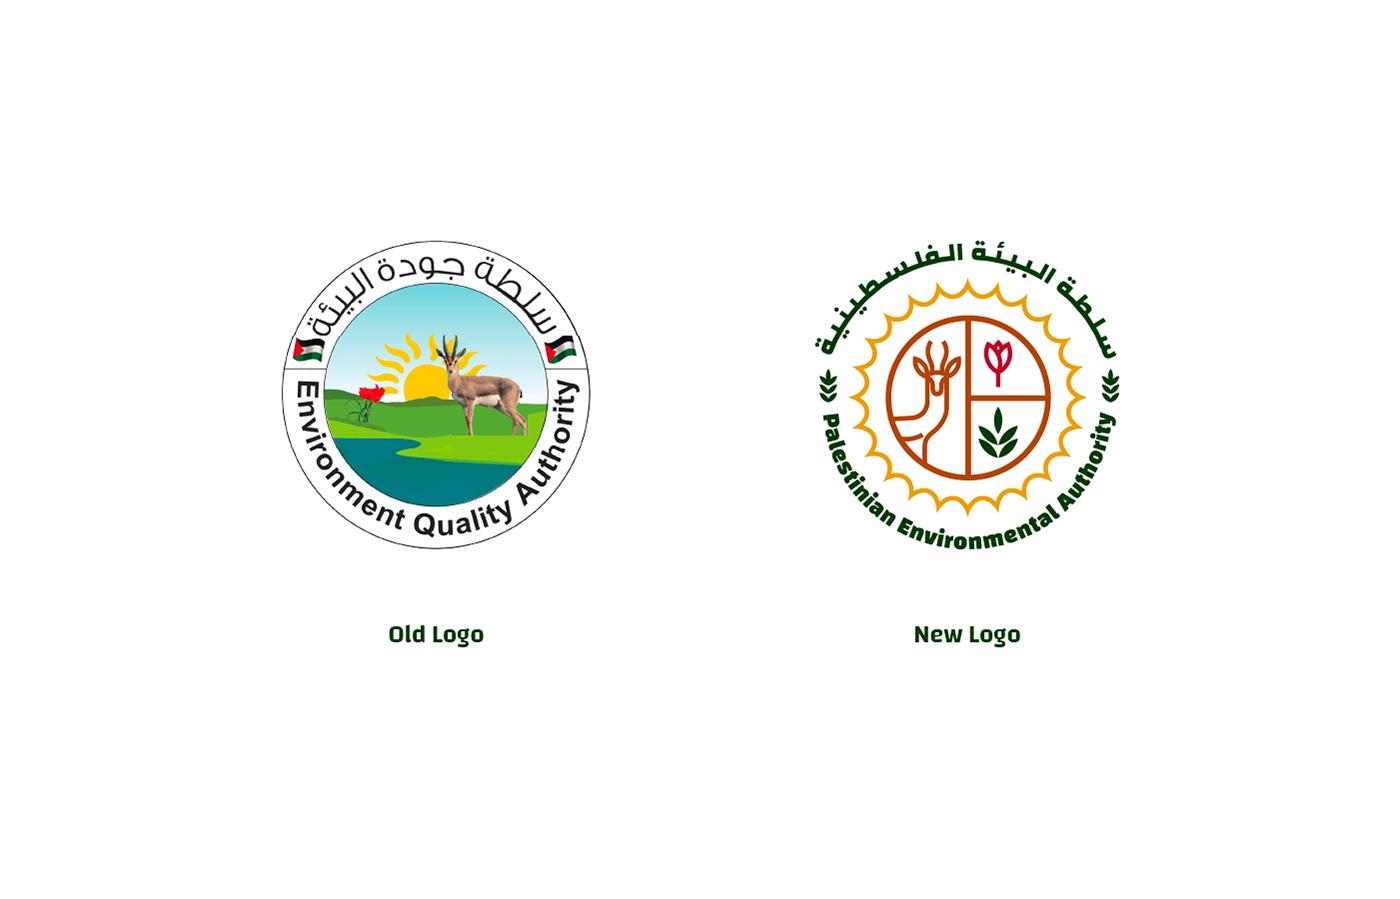 authority branding  emblem logo Environmen branding environmental branding environmental logo identity palestine palestinian visual identity